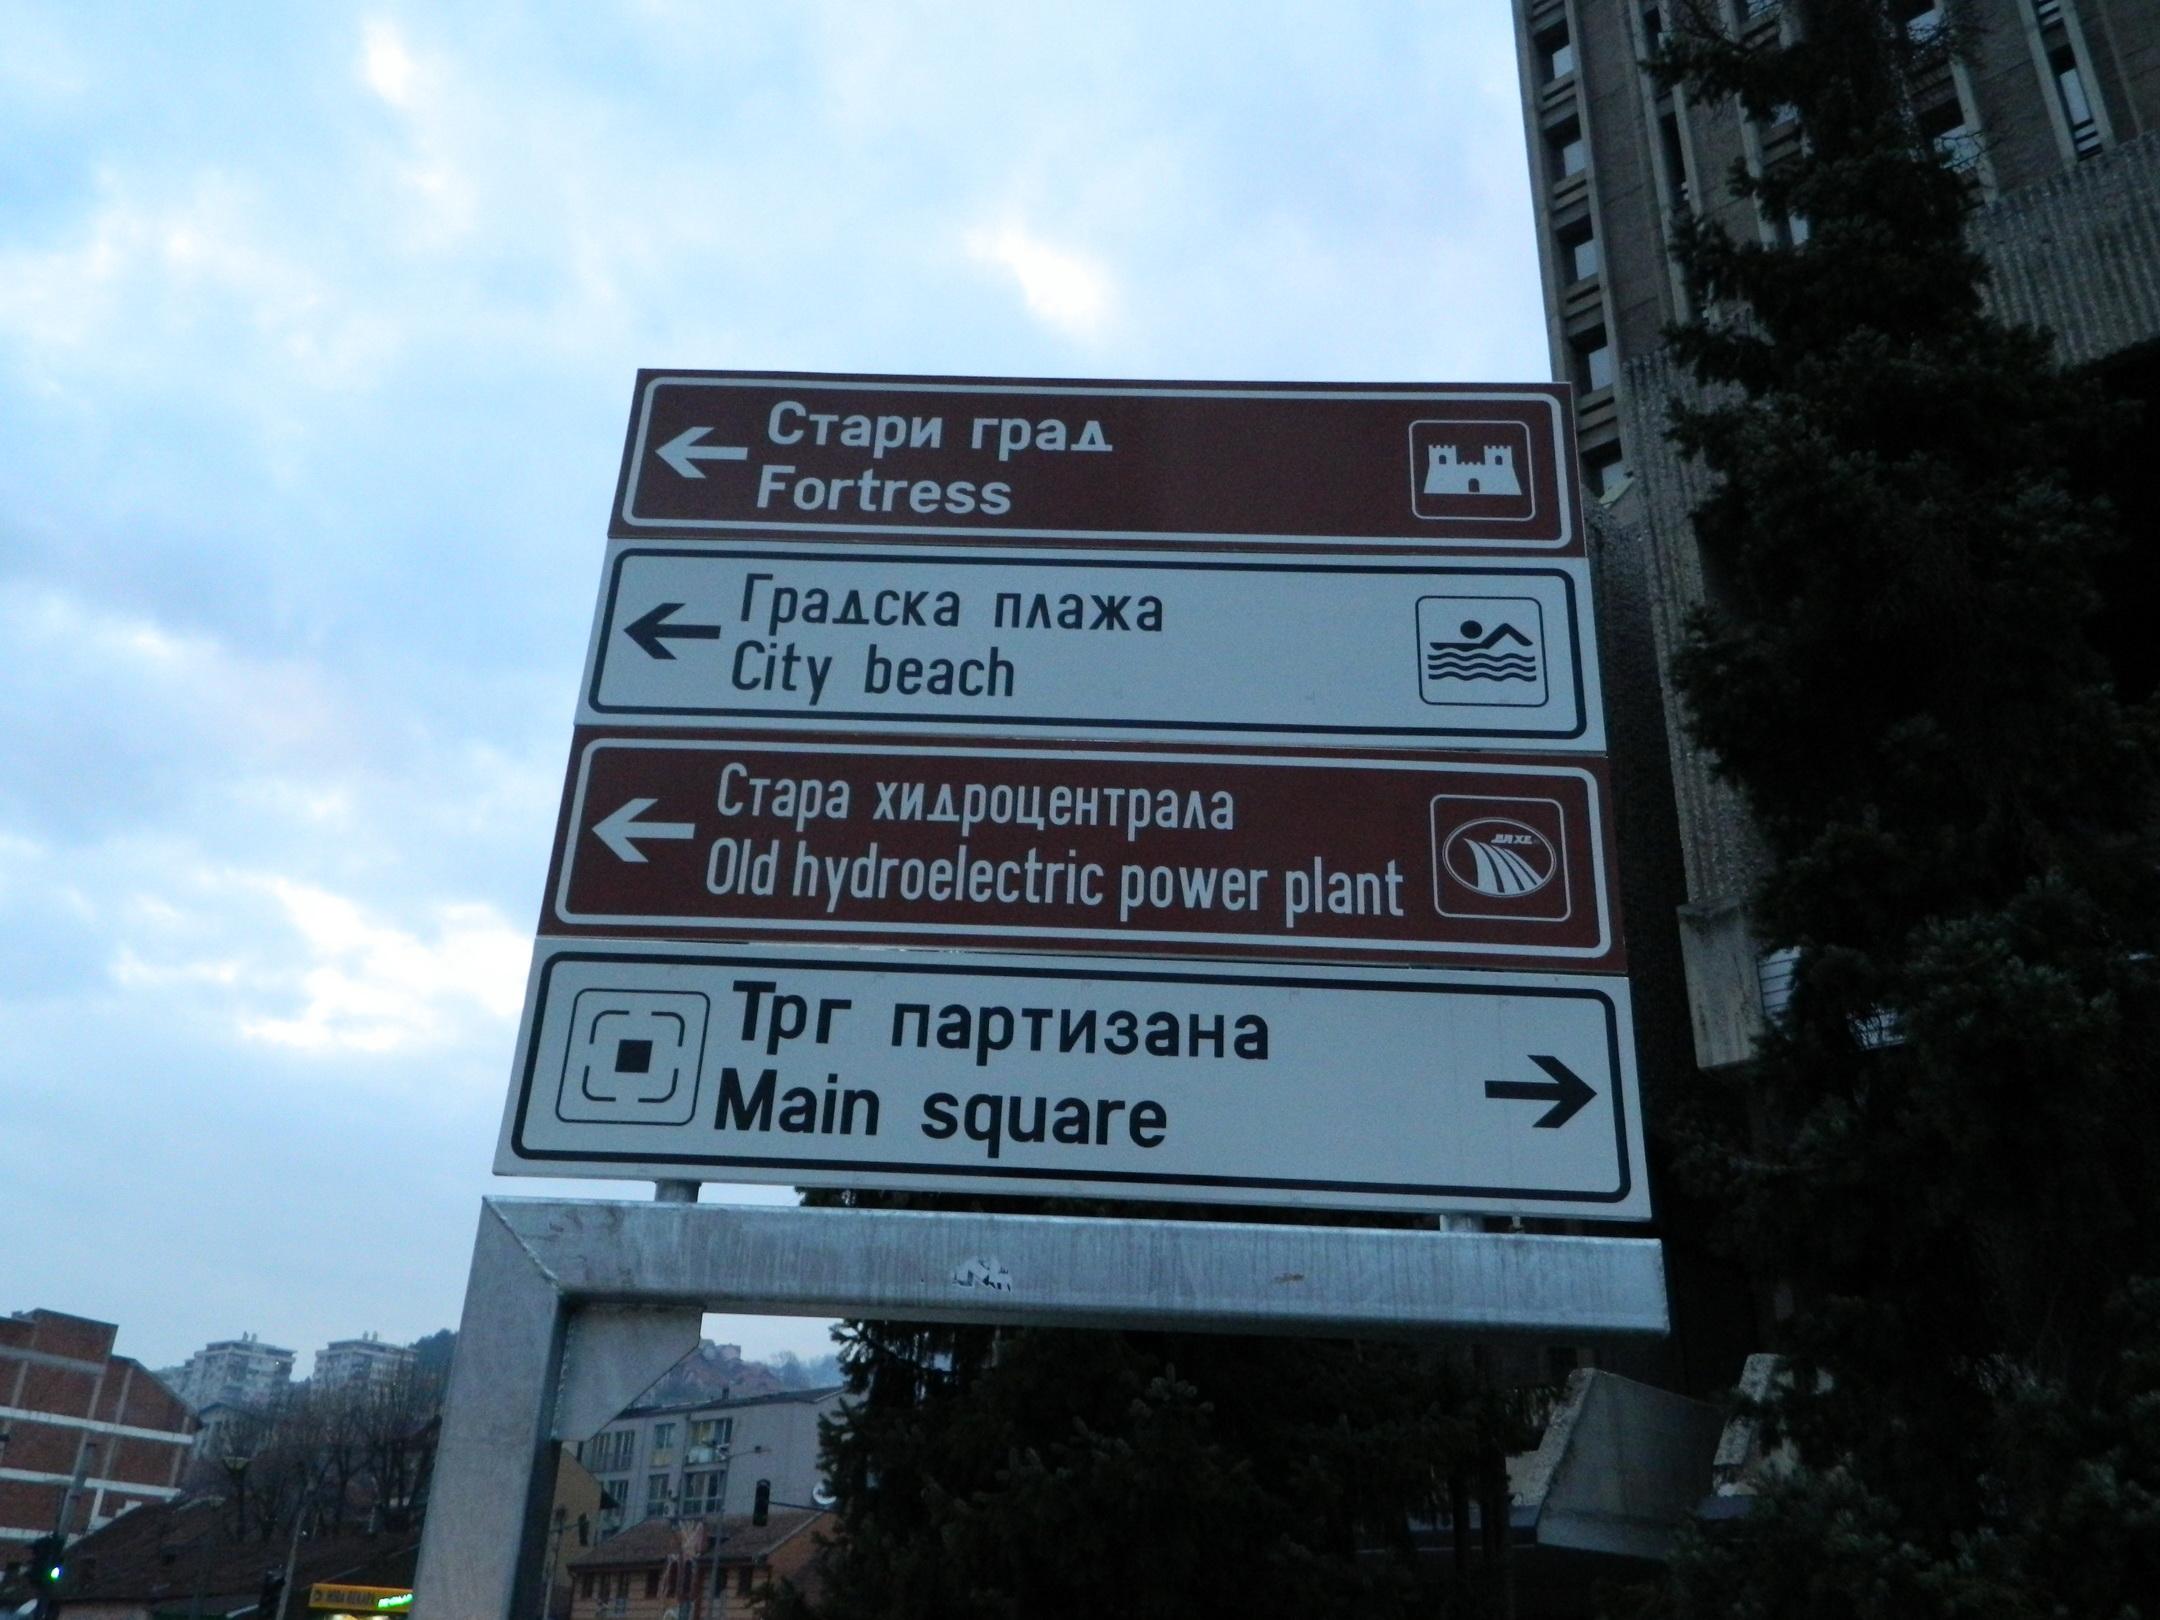 Zamenjeni znakovi